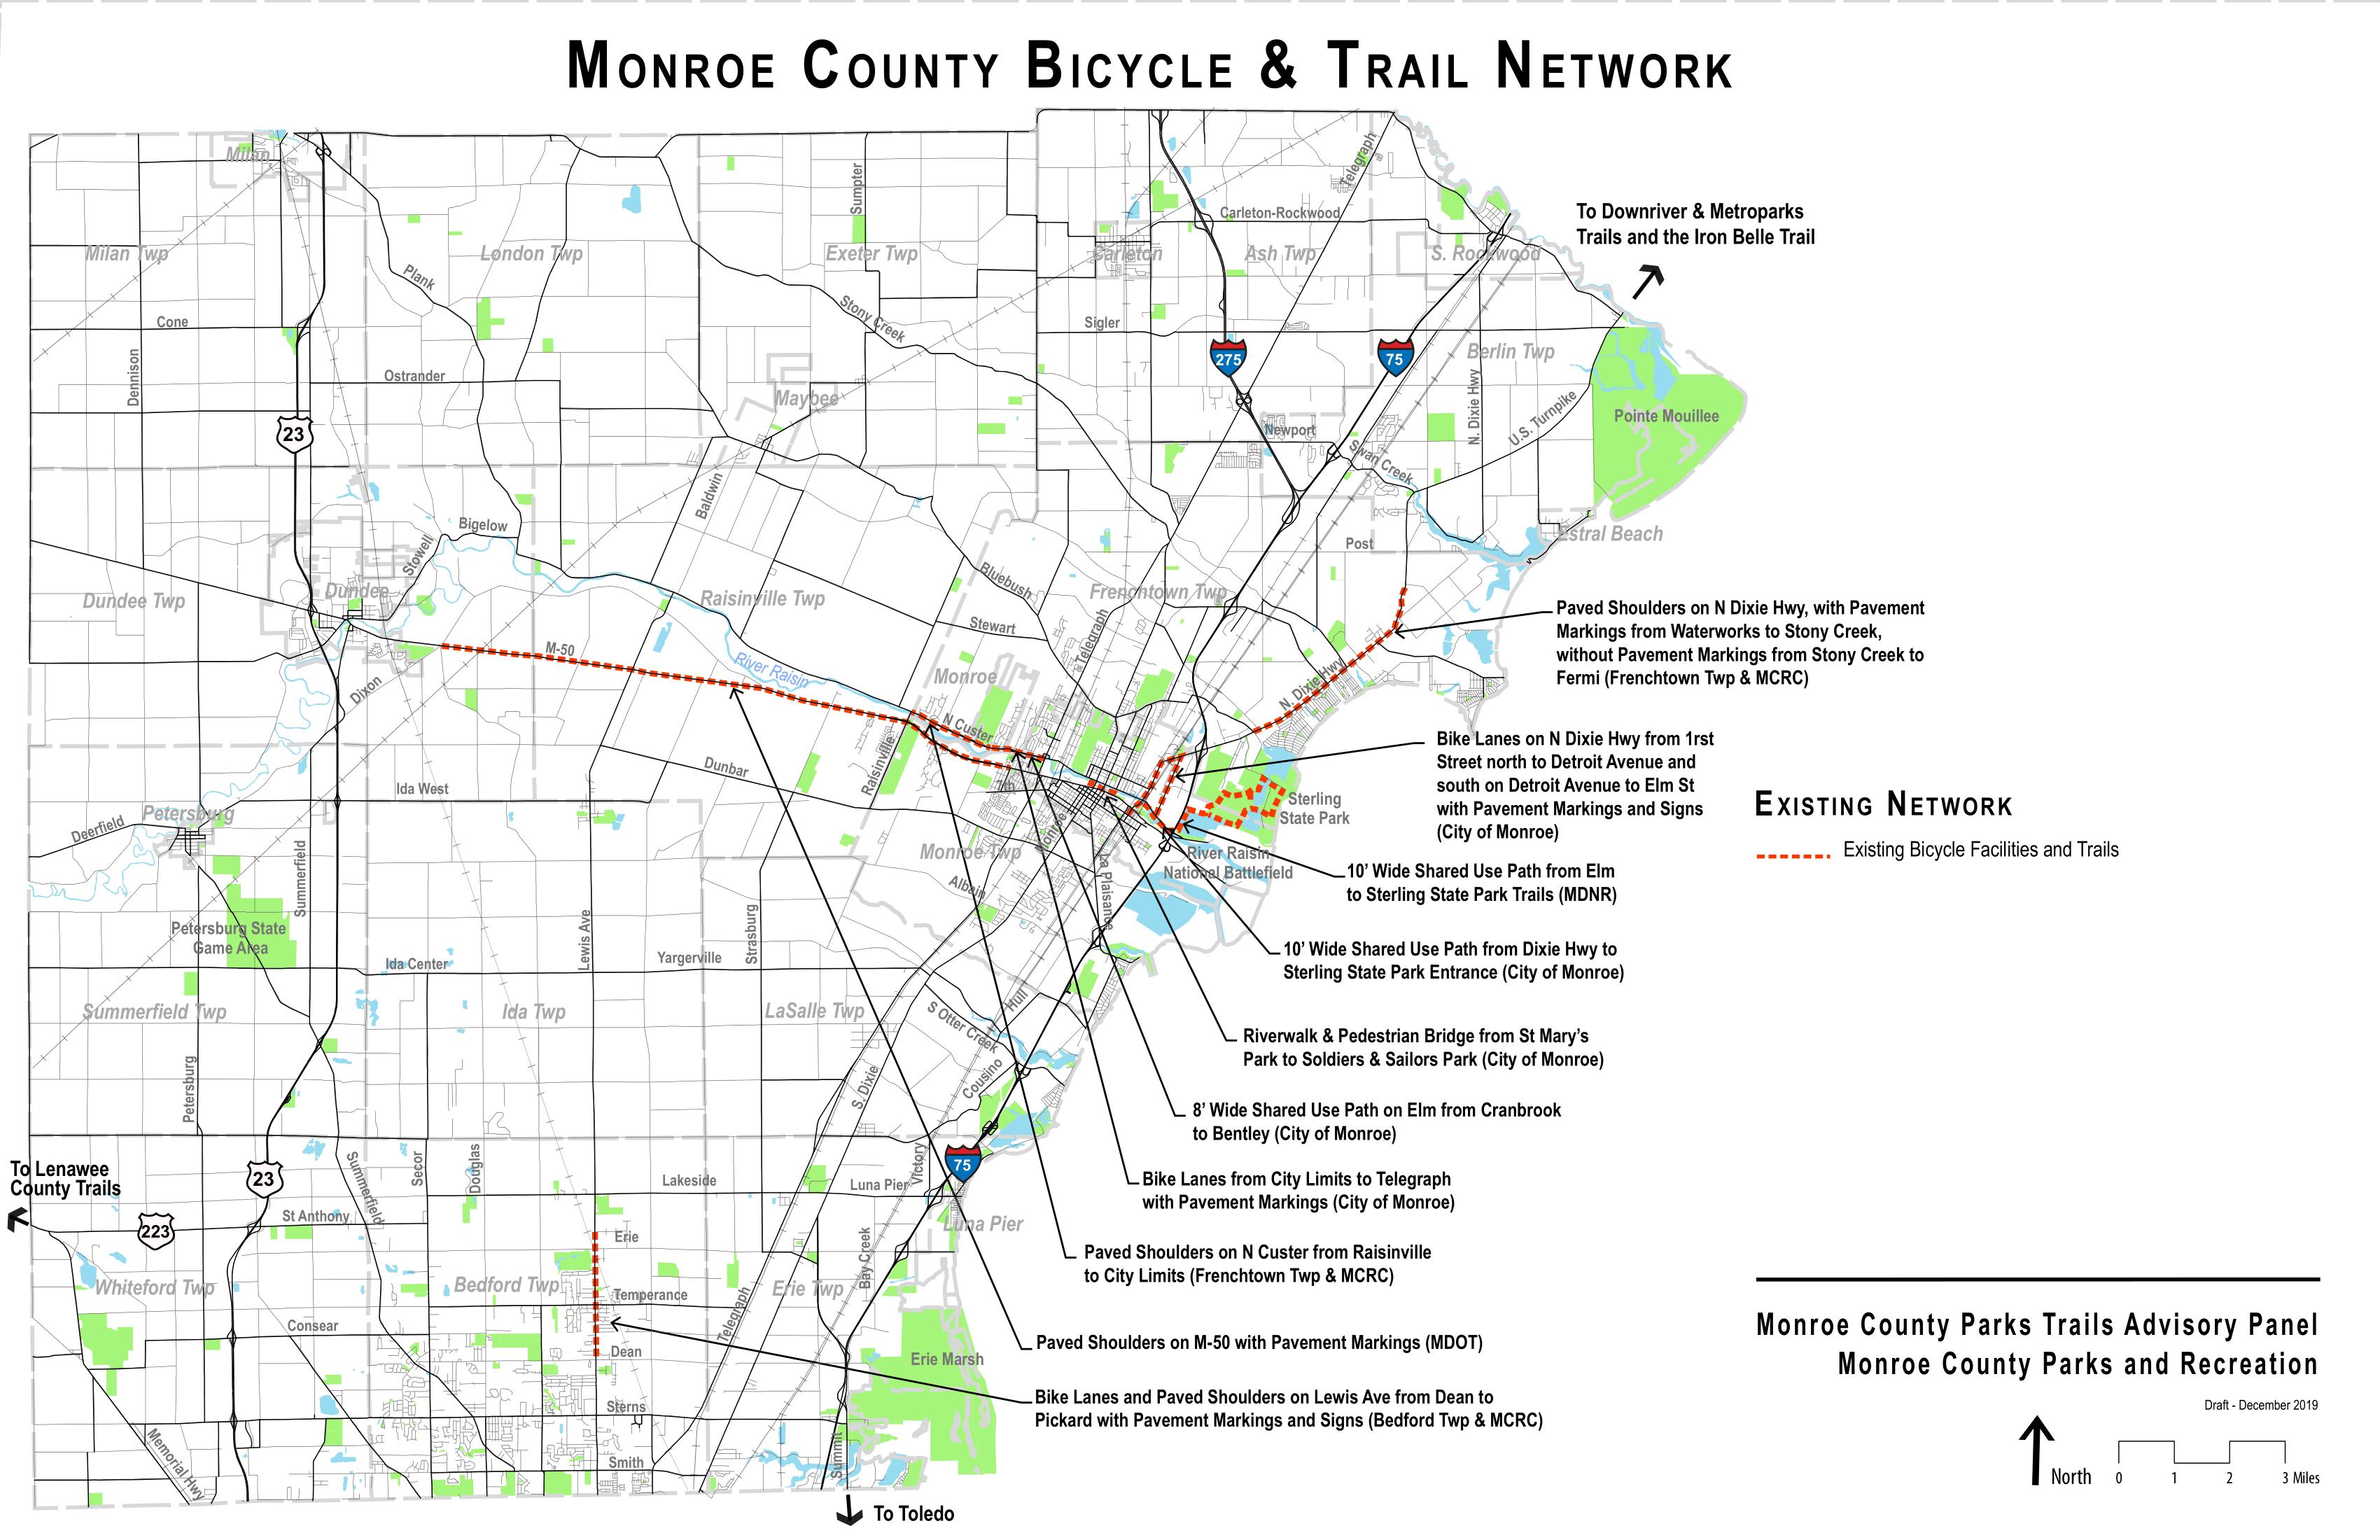 1-MonroeCountyBikeTrailsNetwork_Existing-1 (1)